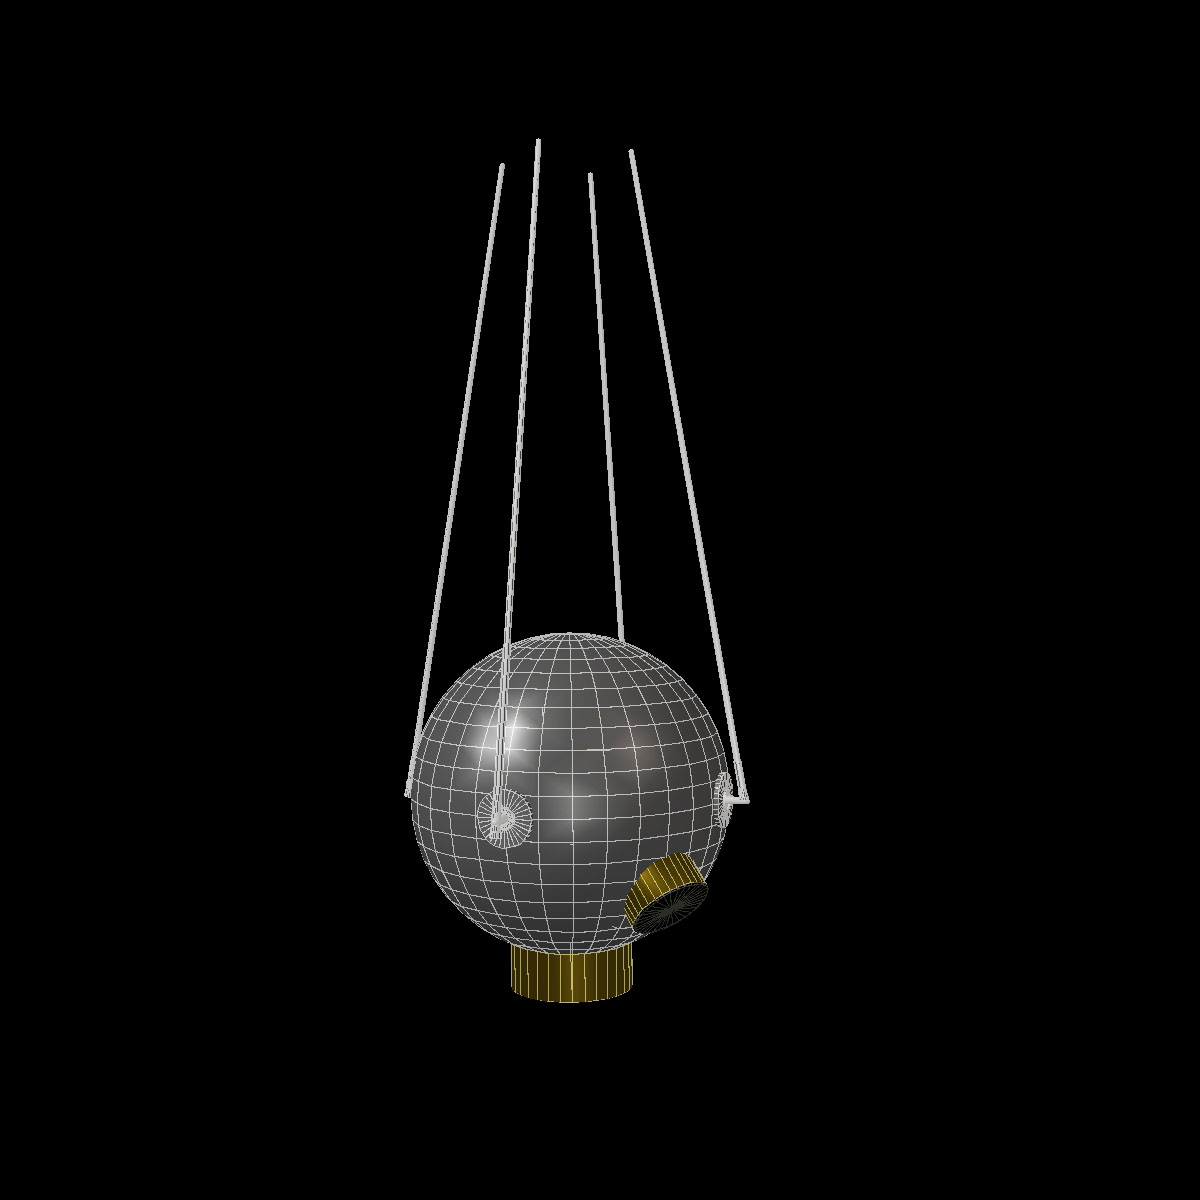 avangard ii satelit 3d model 3ds dxf fbx mješavina cob dae x obj 163947